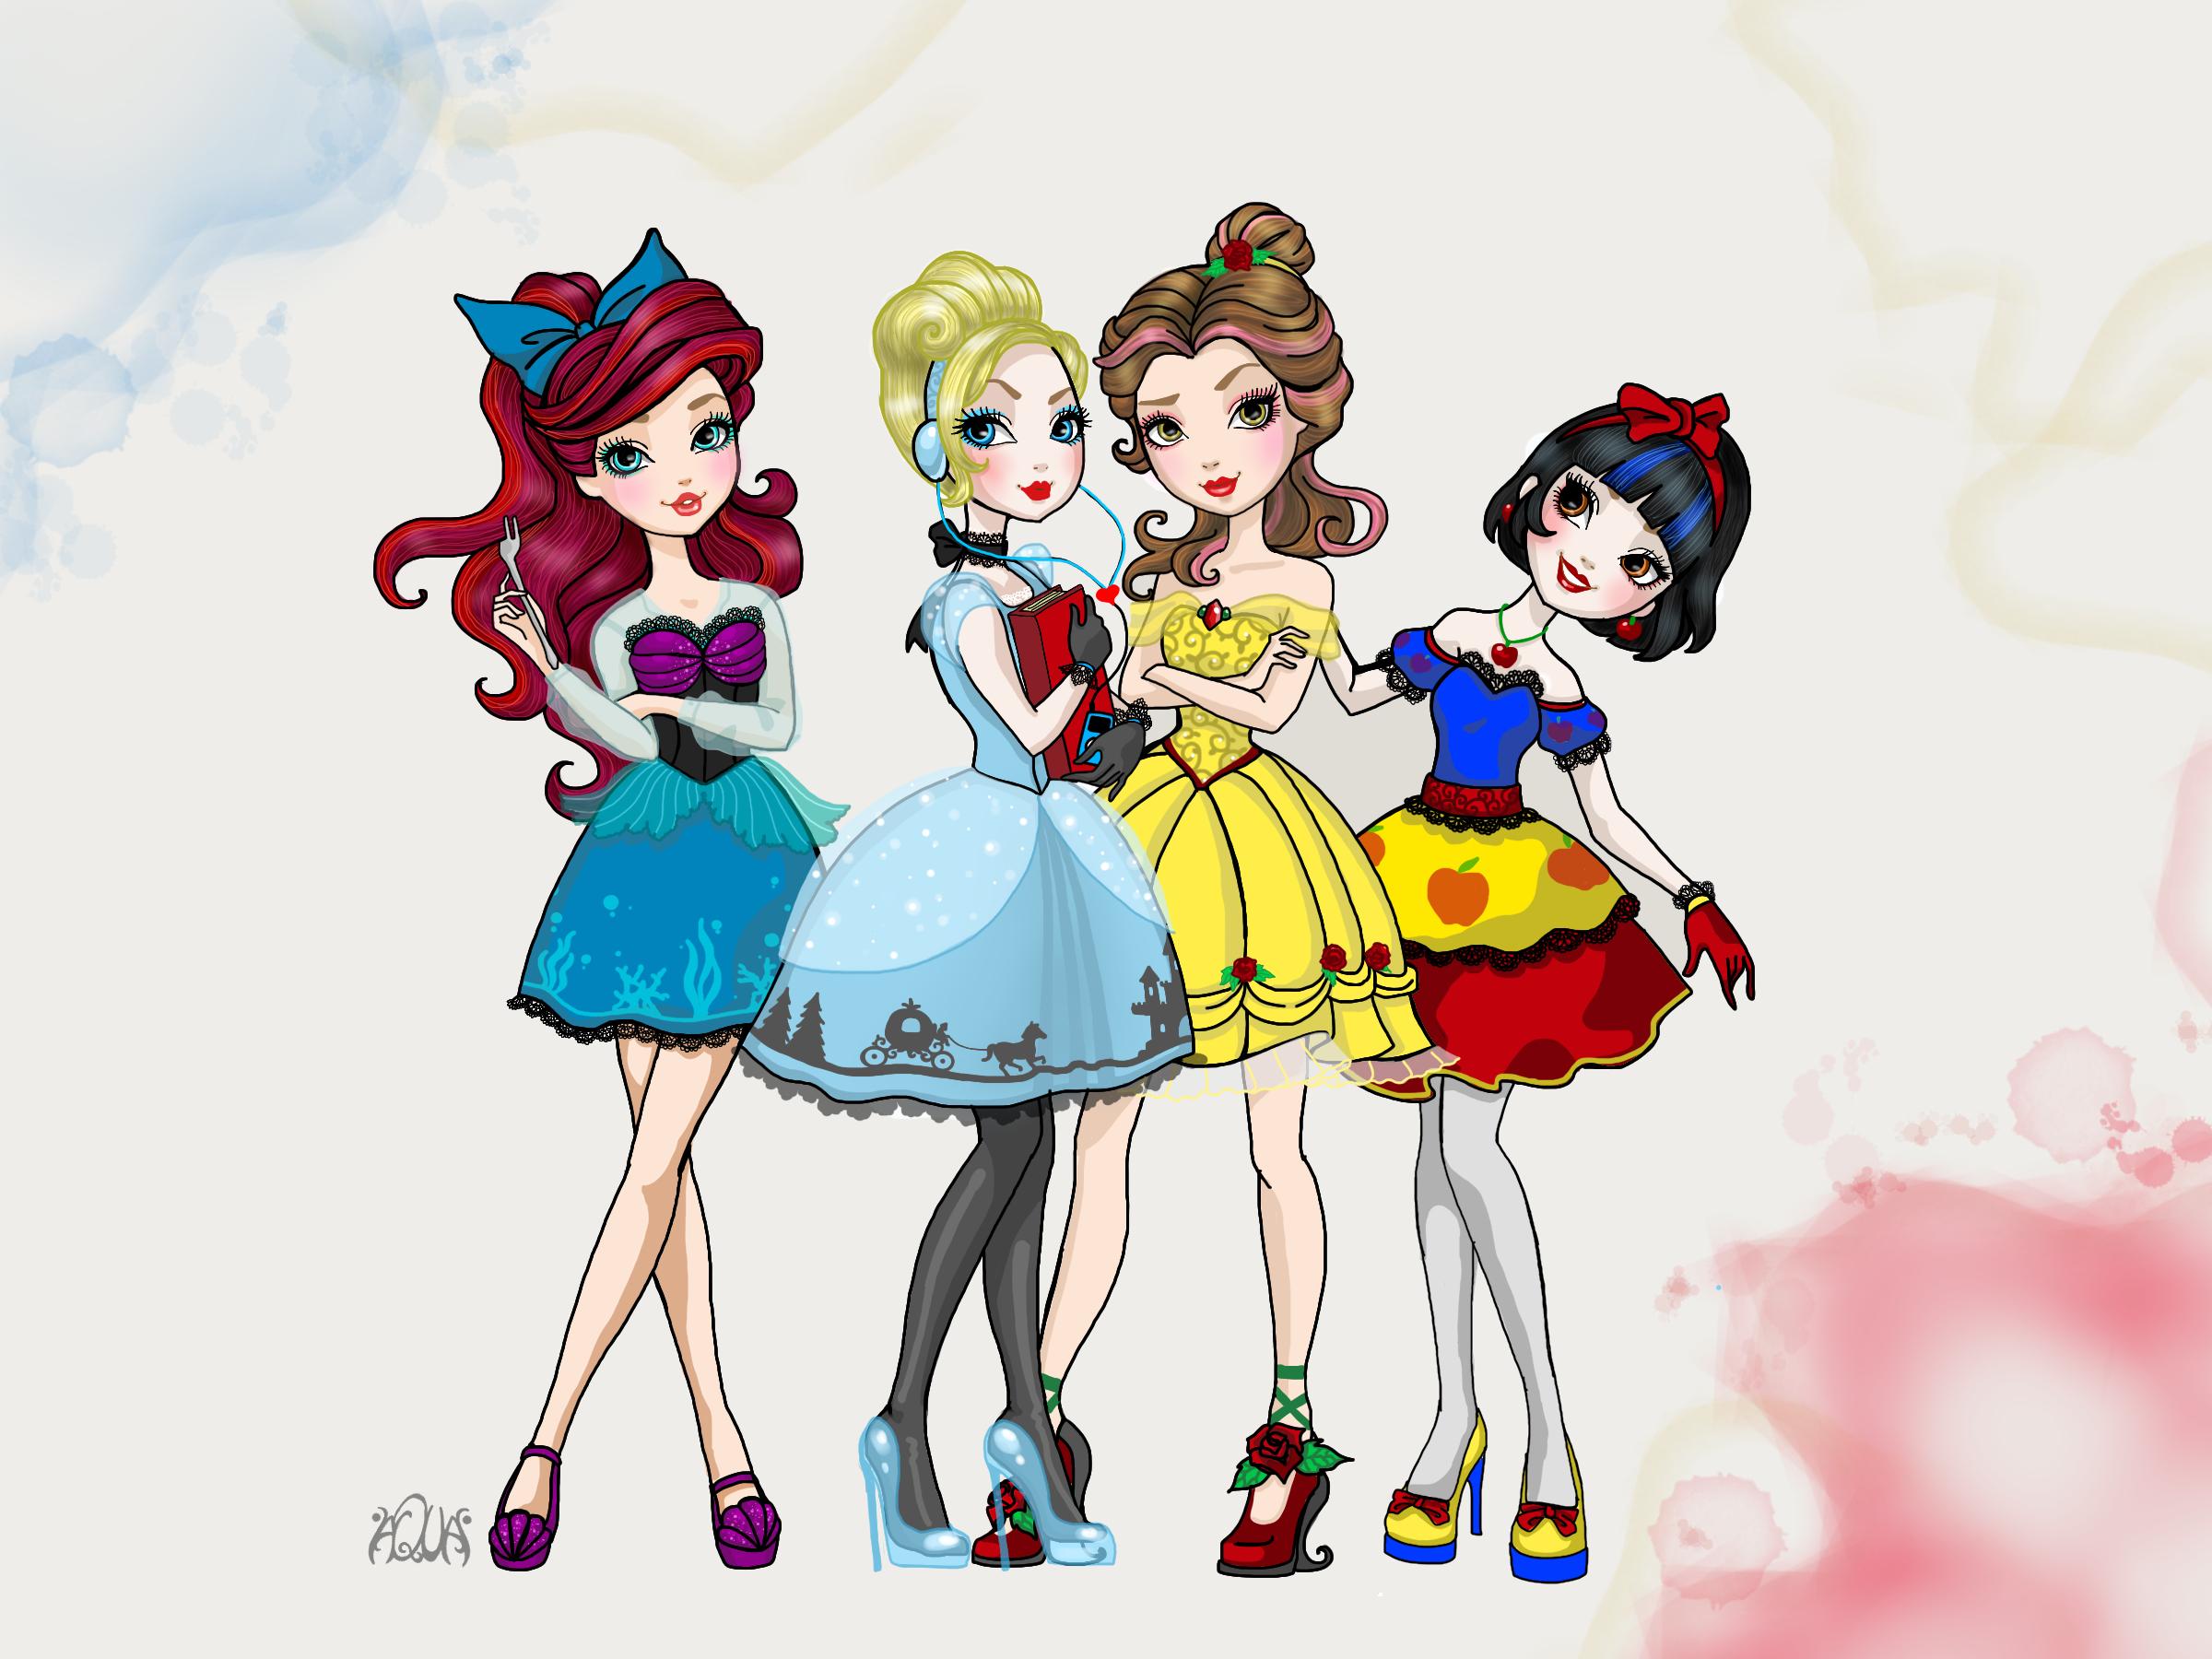 Disney princess ever after by 0aqua mermaid0 on deviantart disney princess ever after by 0aqua mermaid0 altavistaventures Image collections